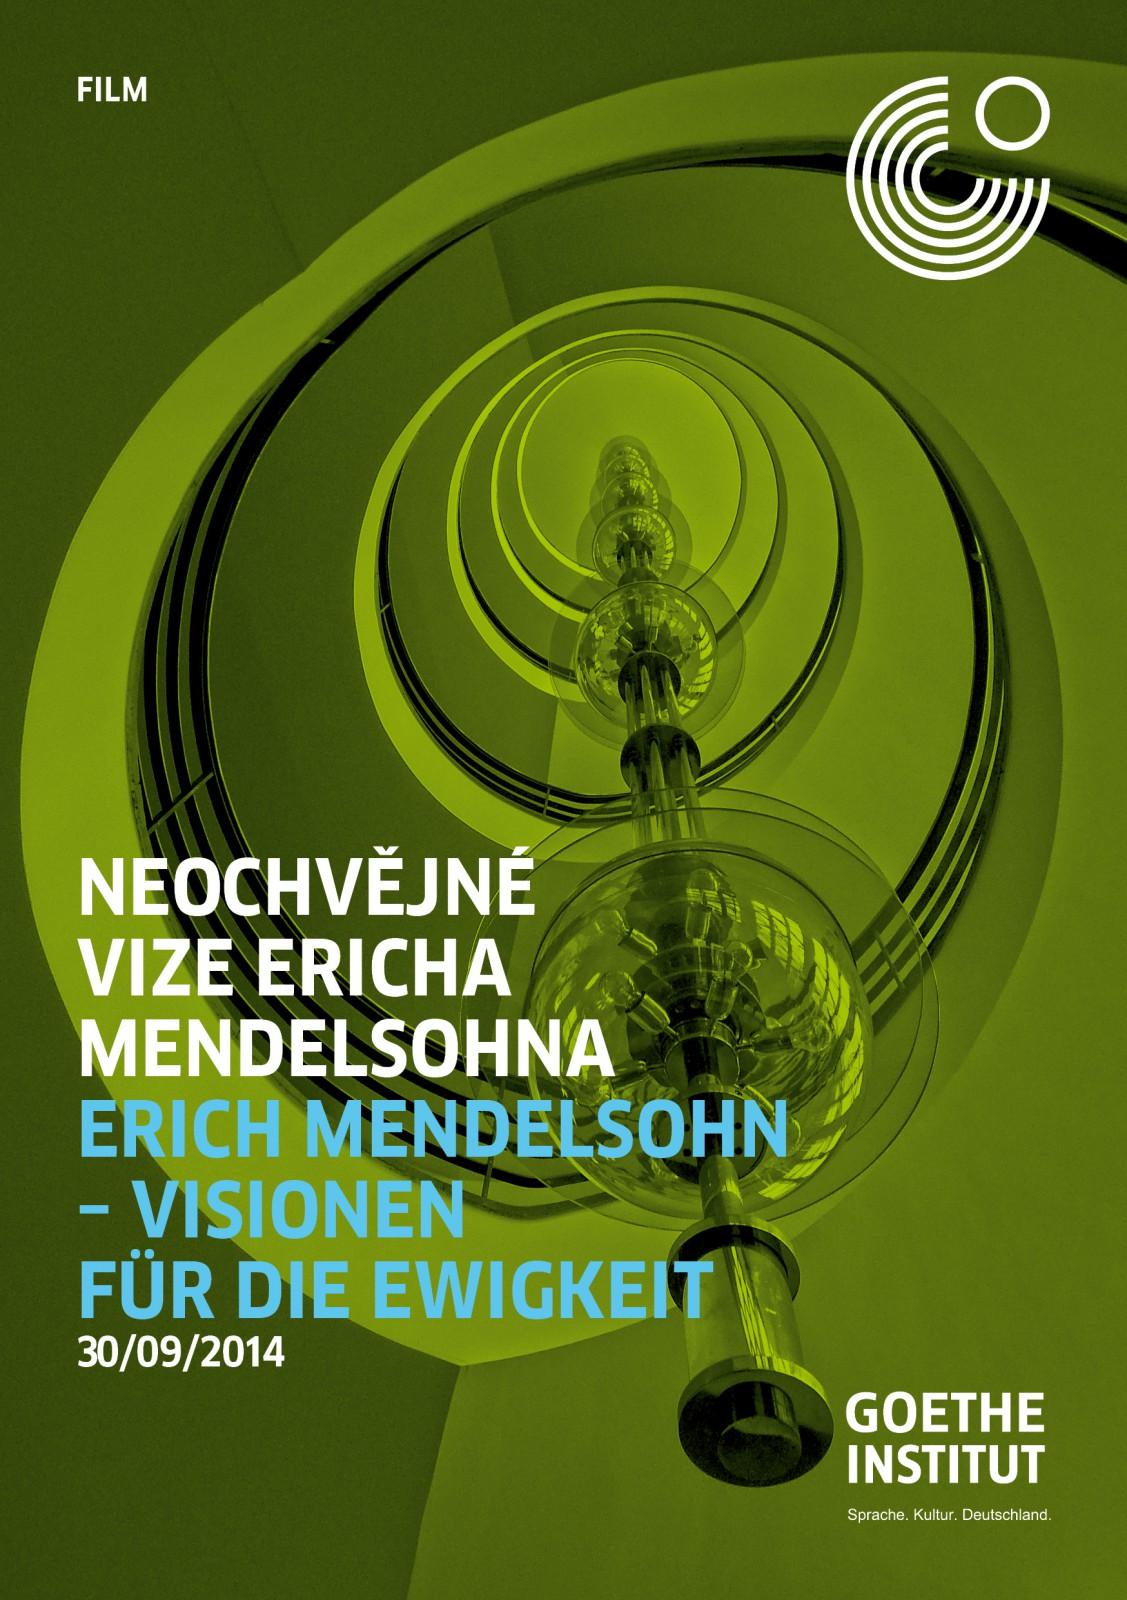 pozvanka_erich-mendelsohn_film1